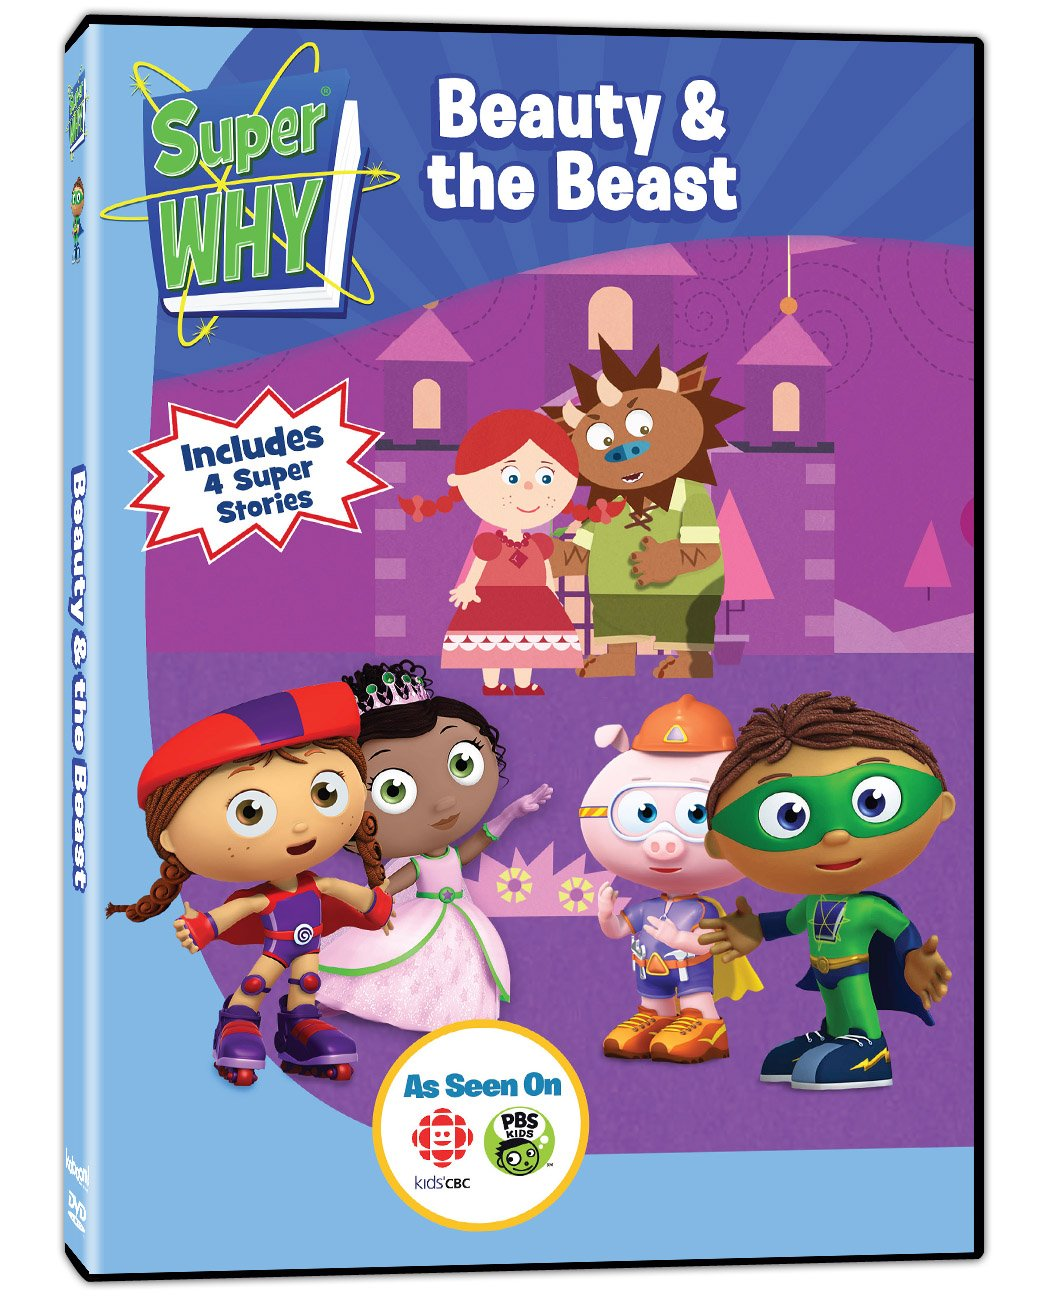 Amazon.com: Super Why!: Beauty & The Beast: Movies & TV